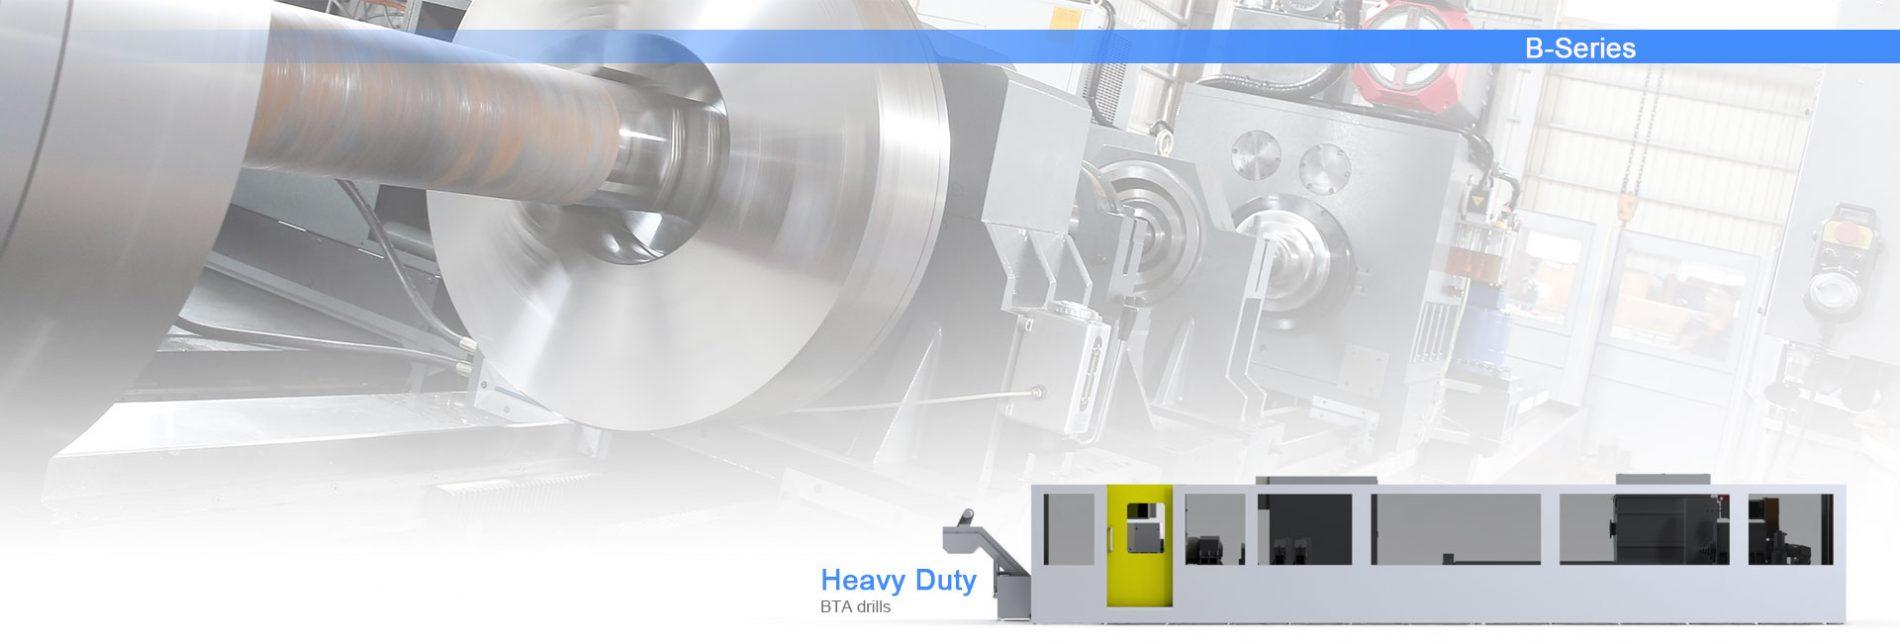 BTA drilling machine